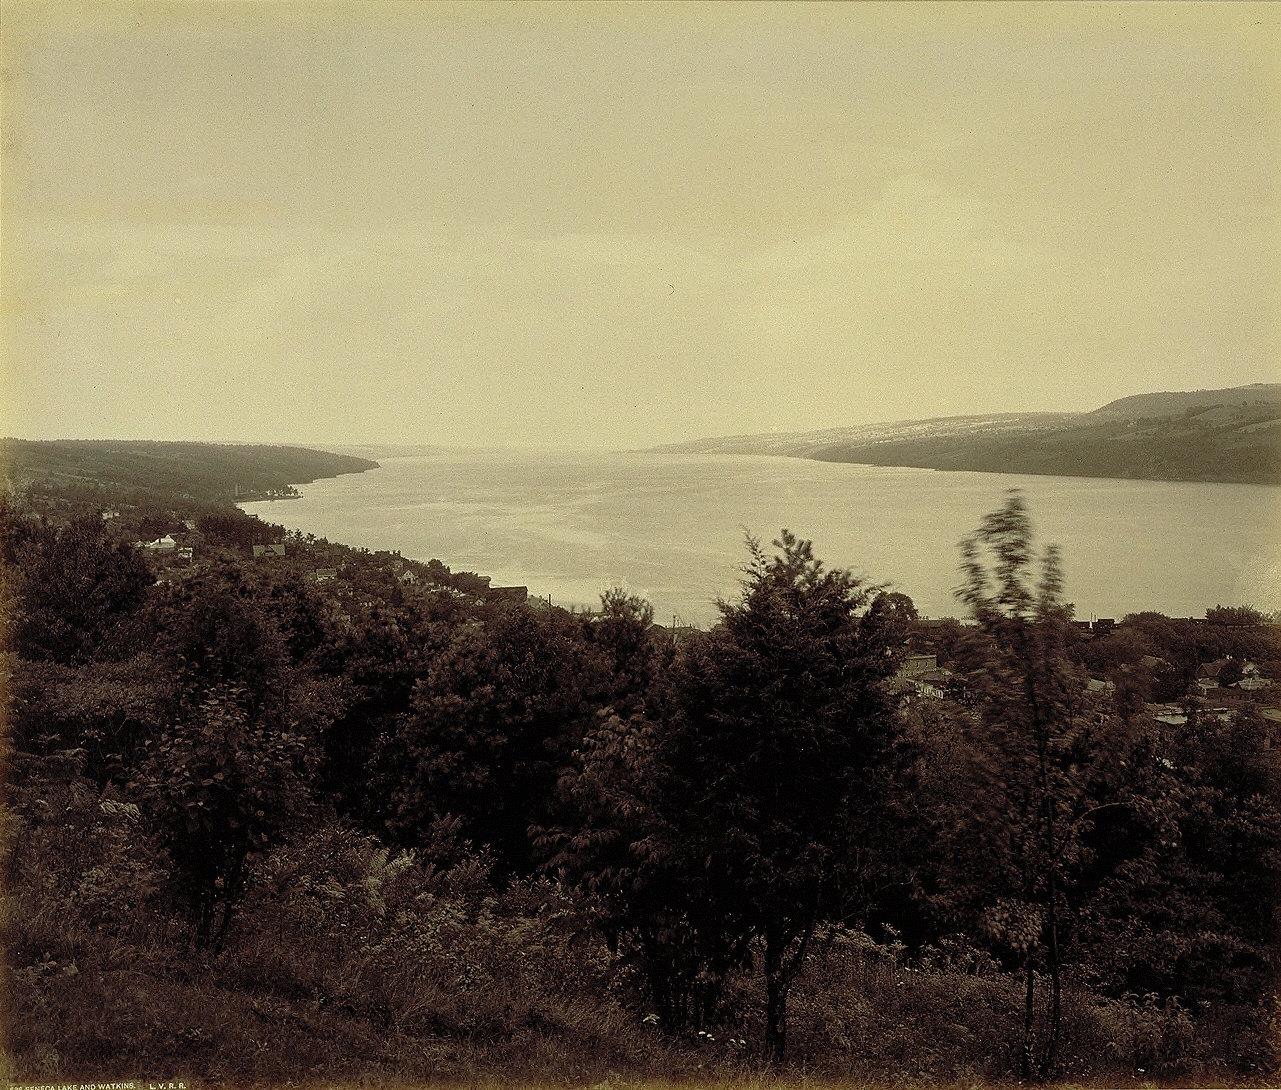 Seneca Lake and Watkins Glen, for the Lehigh Valley Railroad